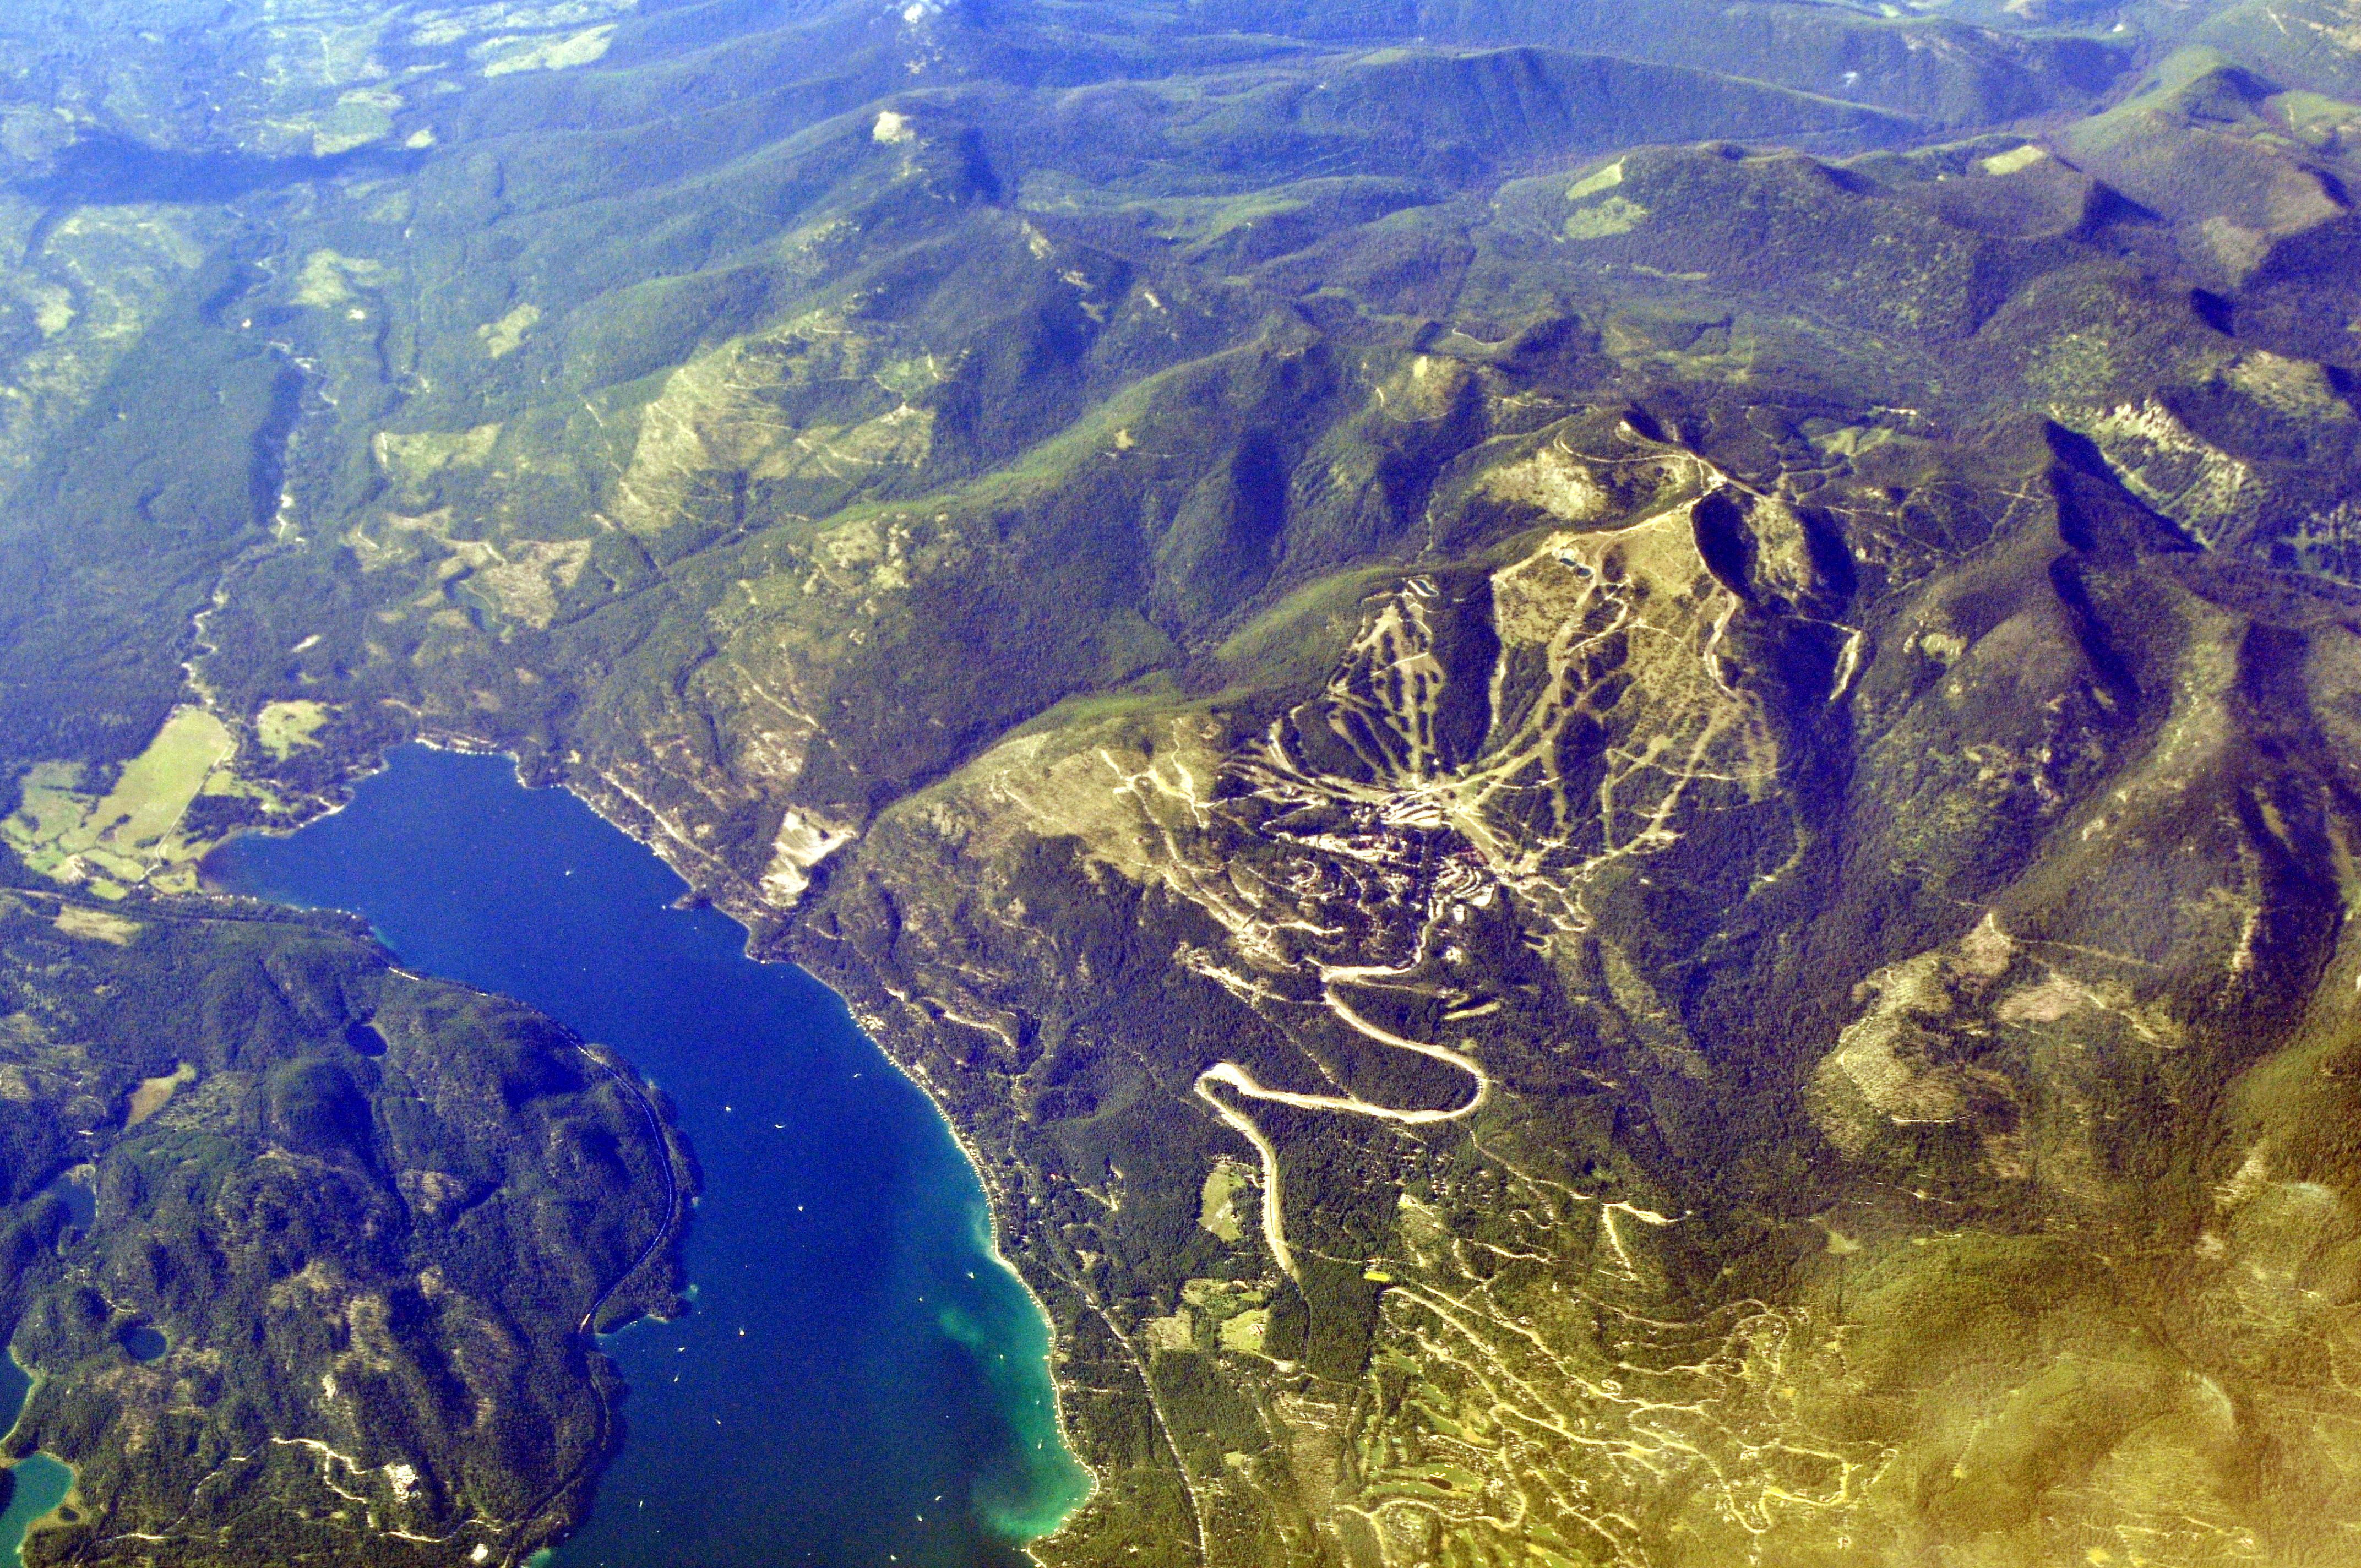 35 interesting photos of city of whitefish montana for White fish montana